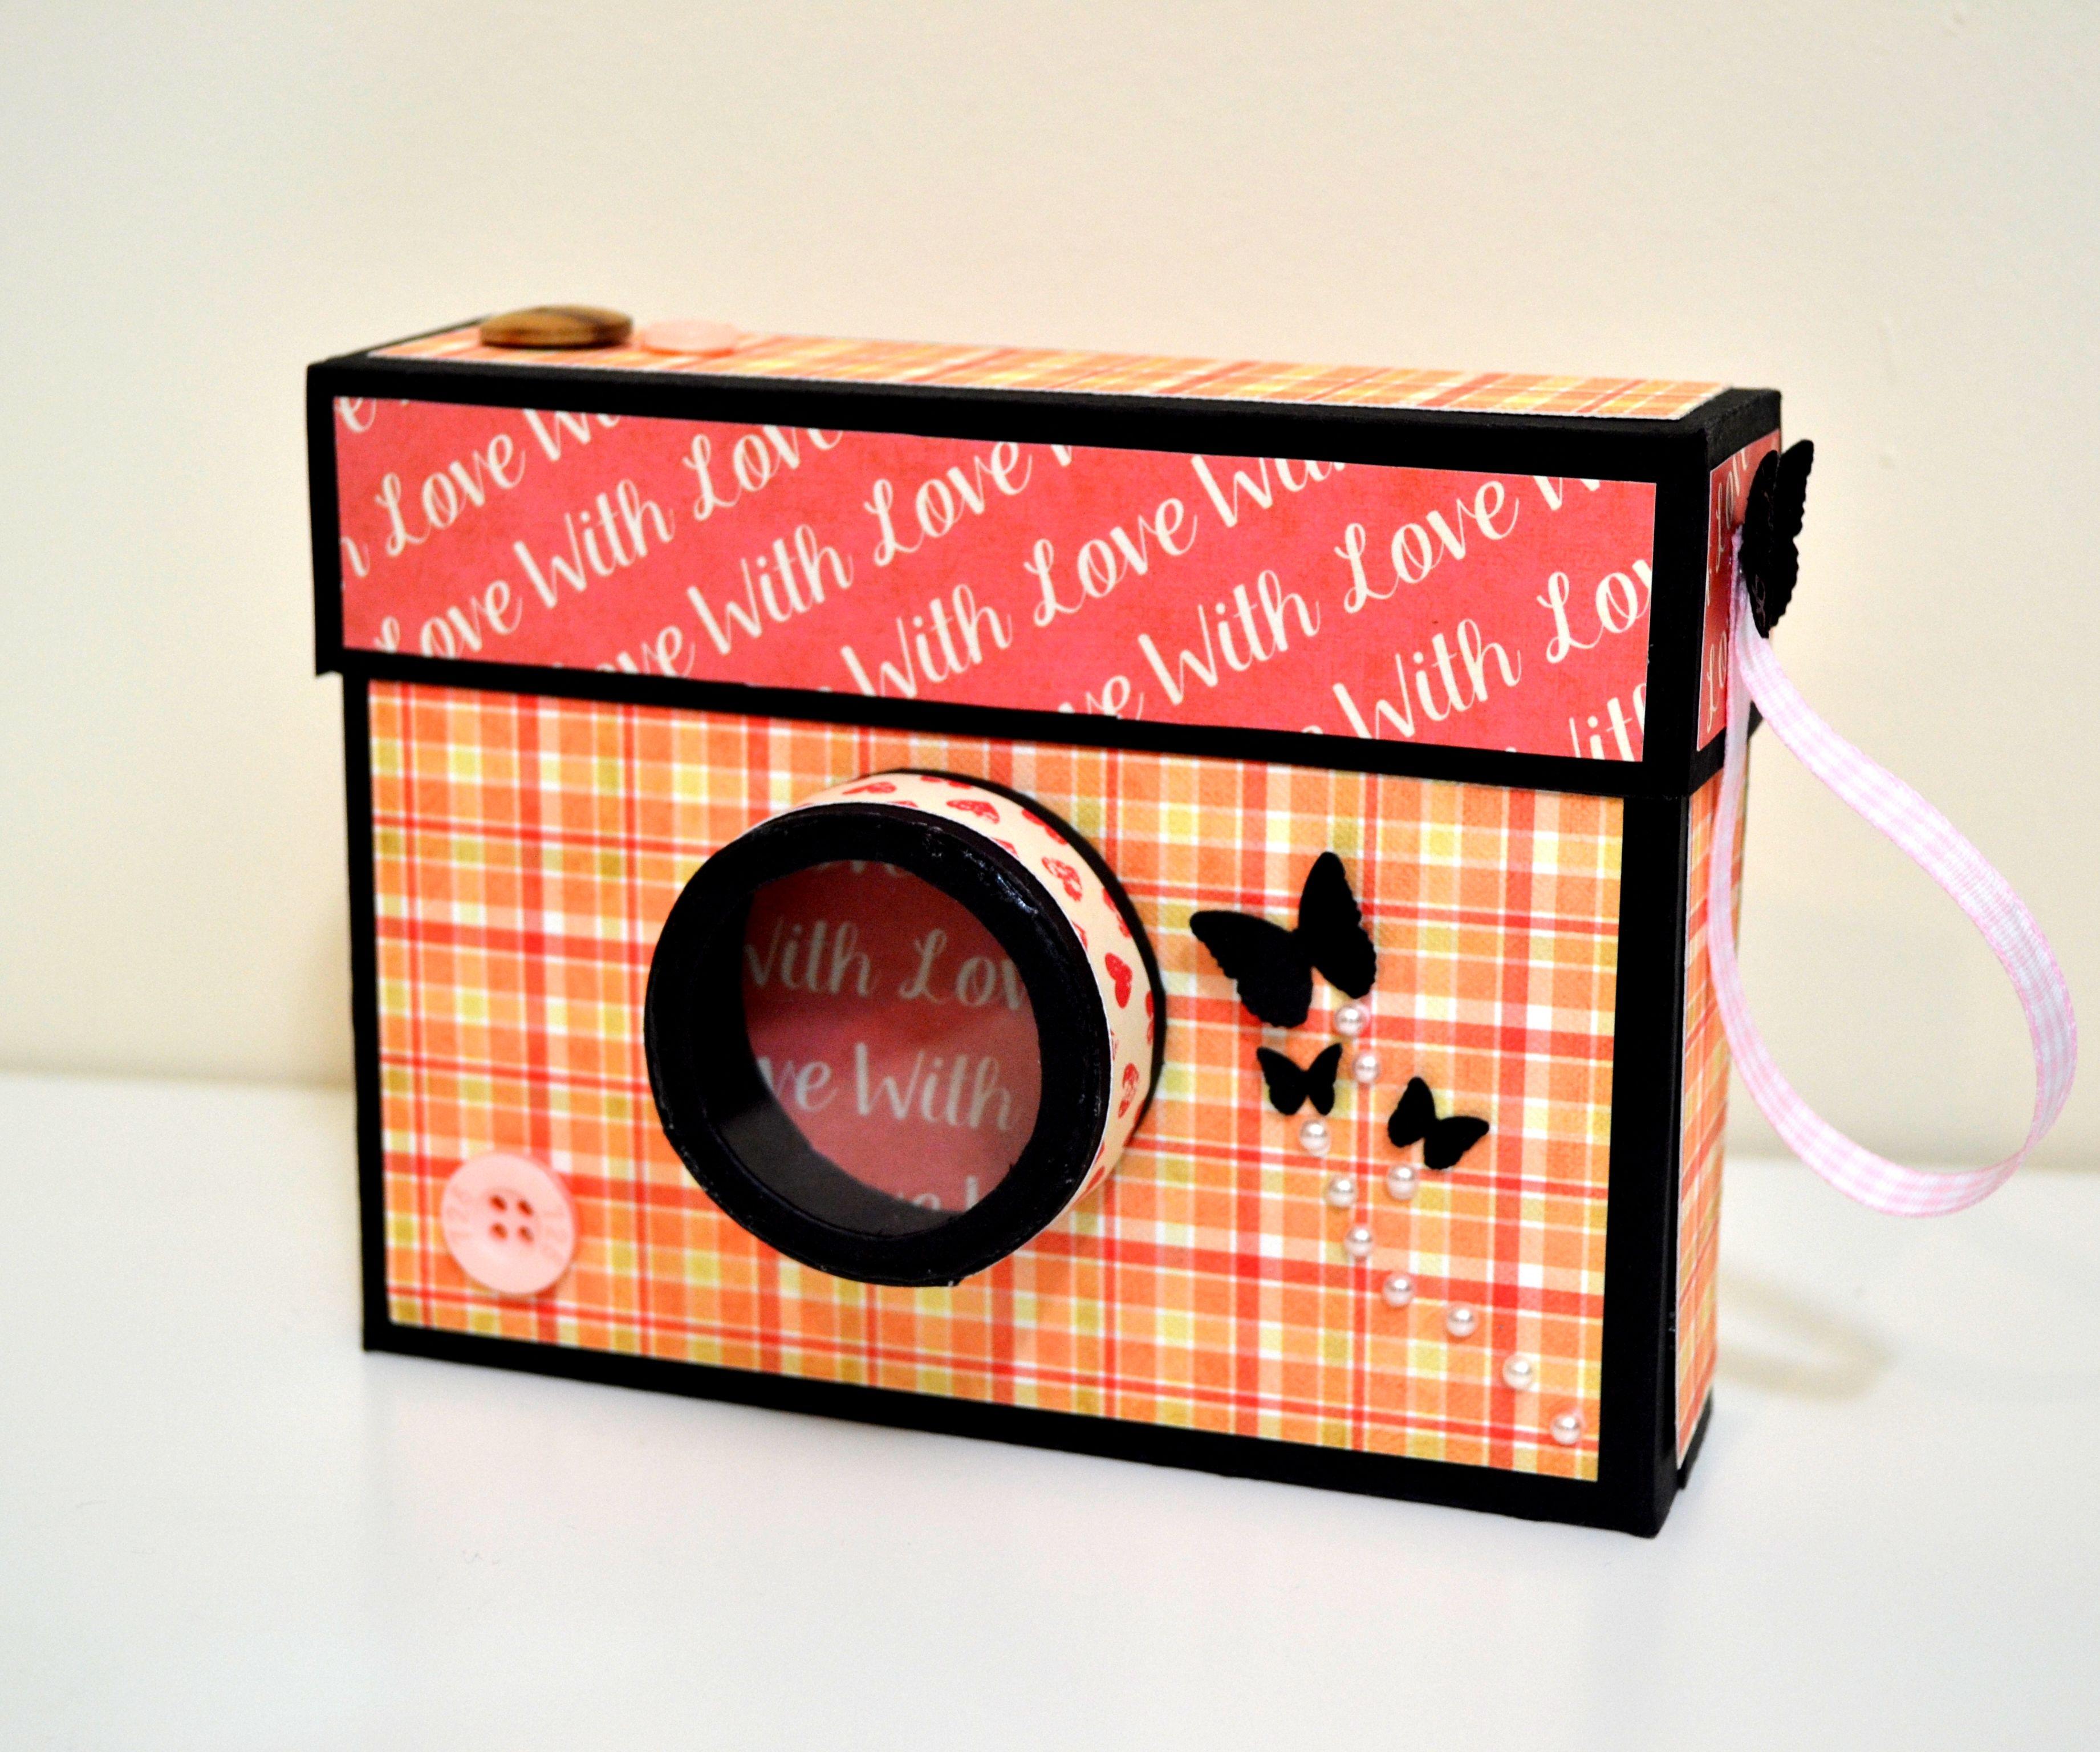 DIY Crafts - How to Make Camera Box Photo Album - Valentine's Day Gift Idea